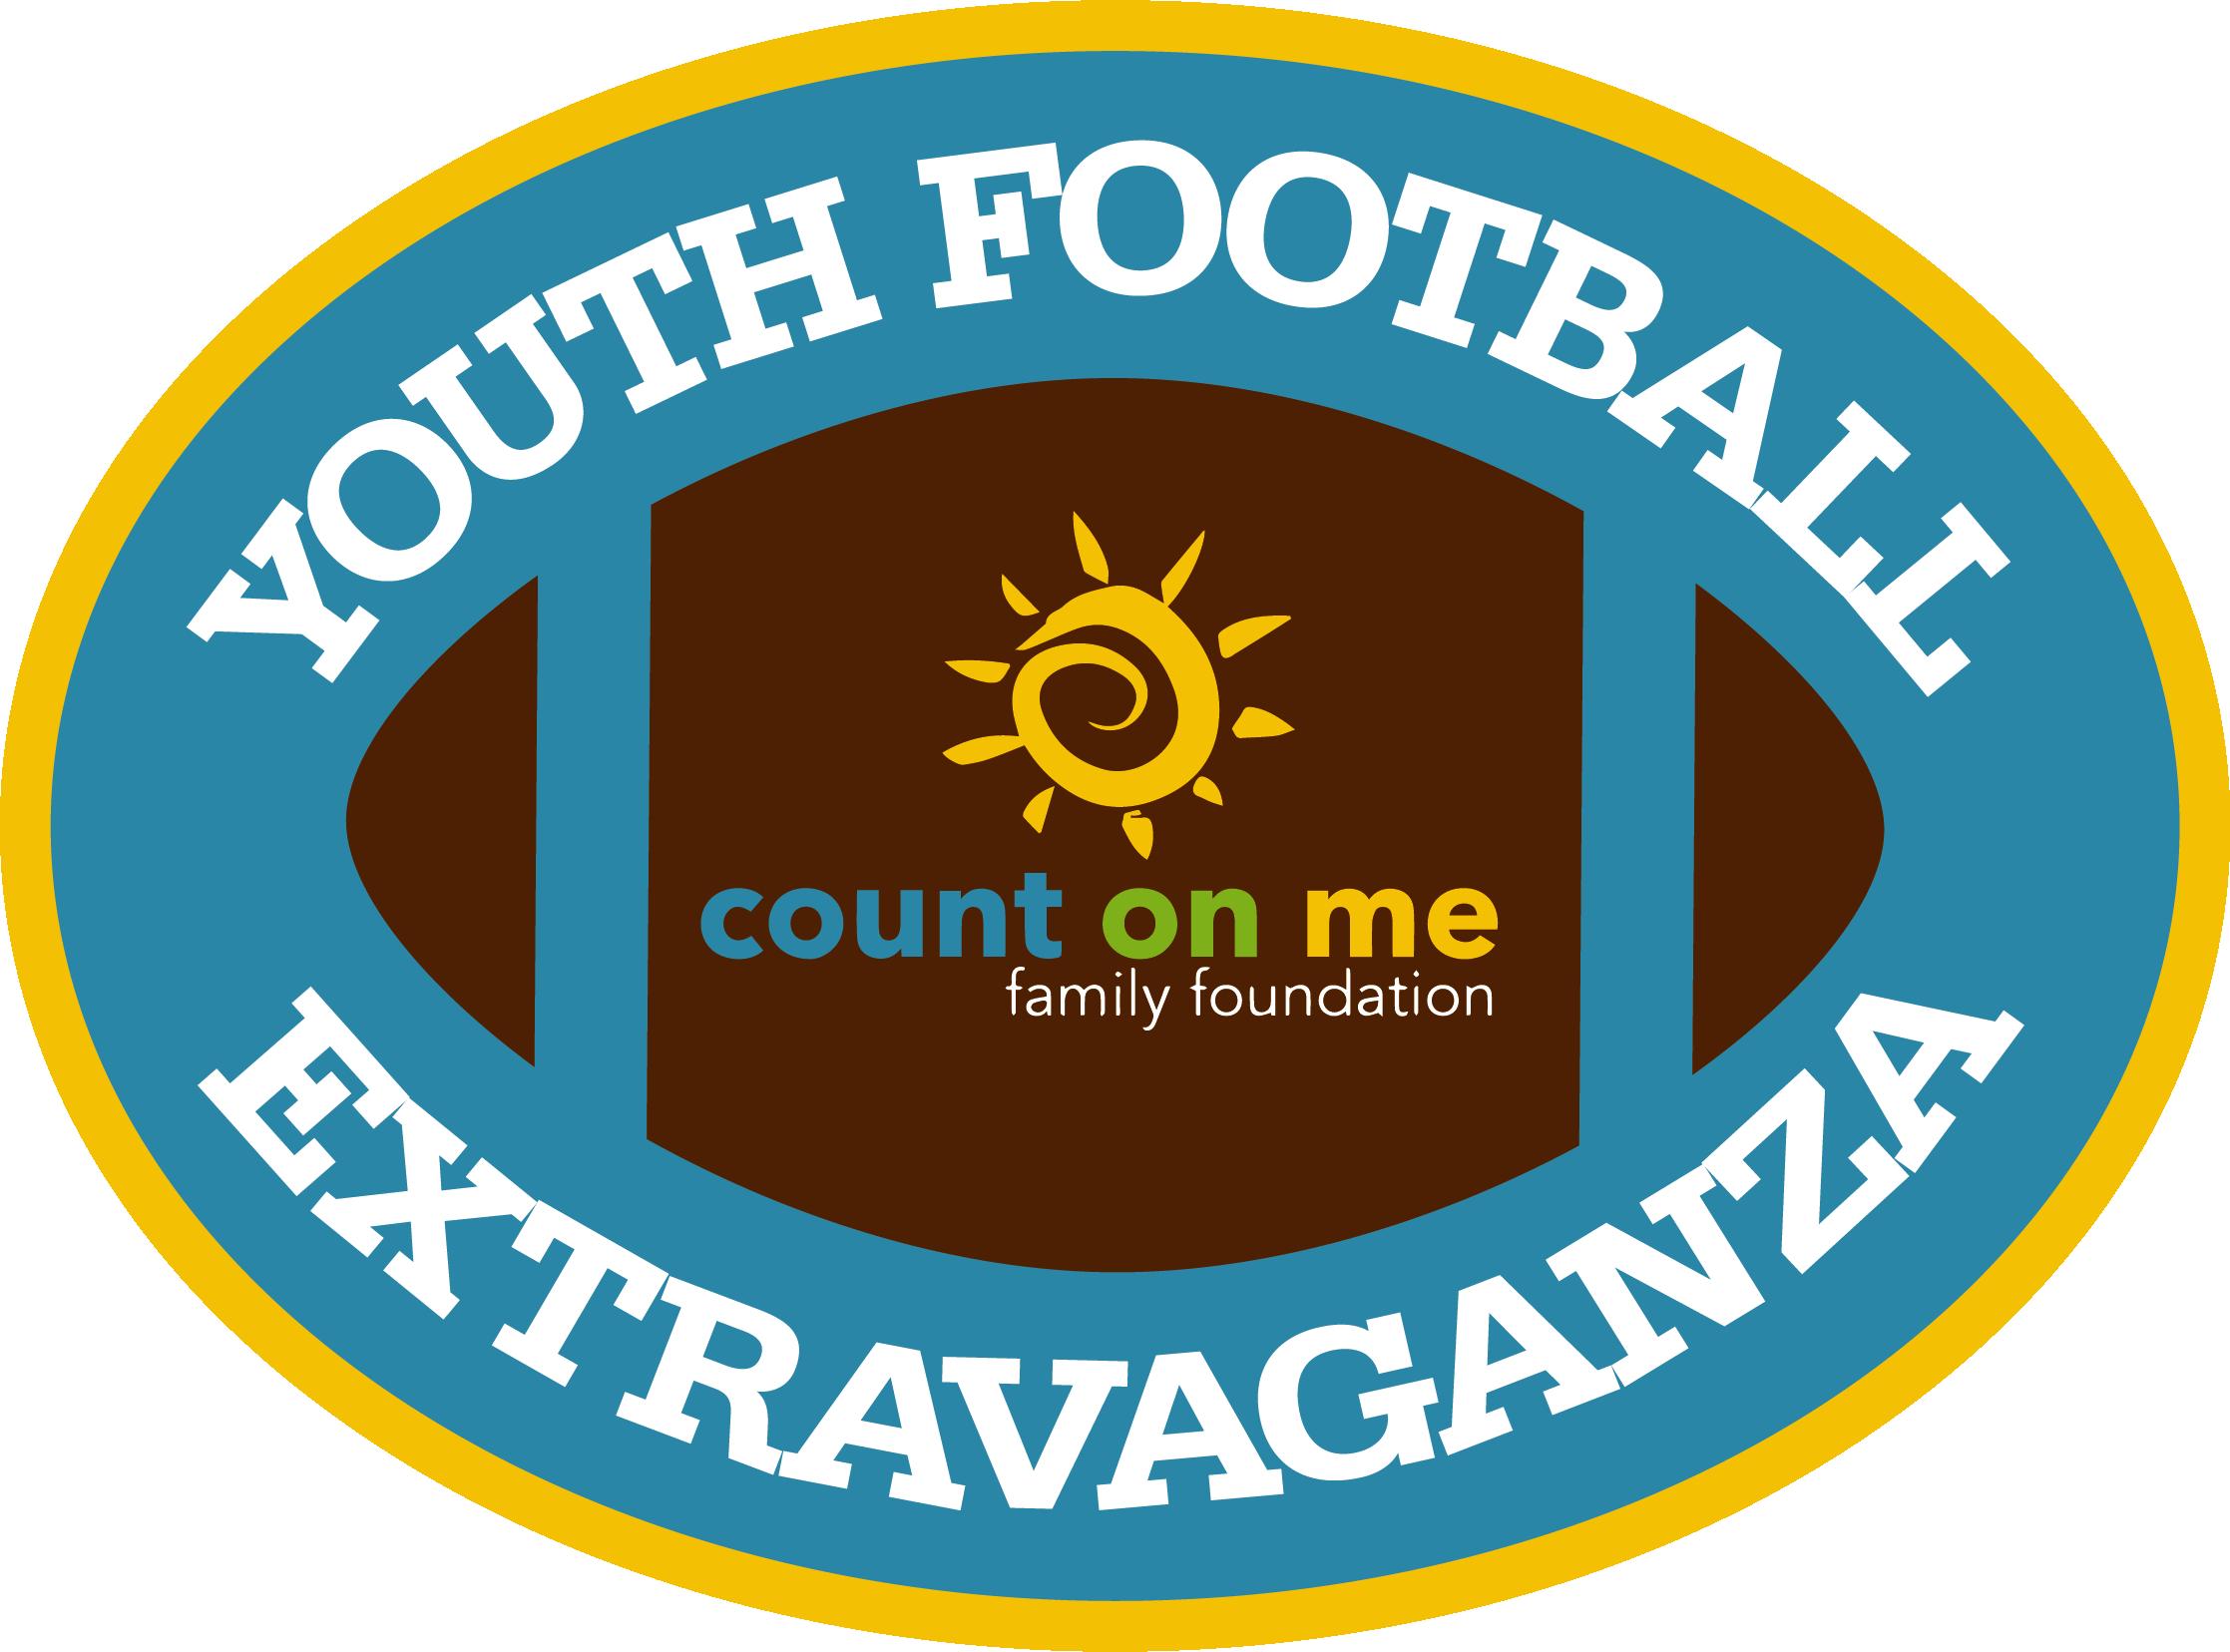 comff18_YFE_logo.png